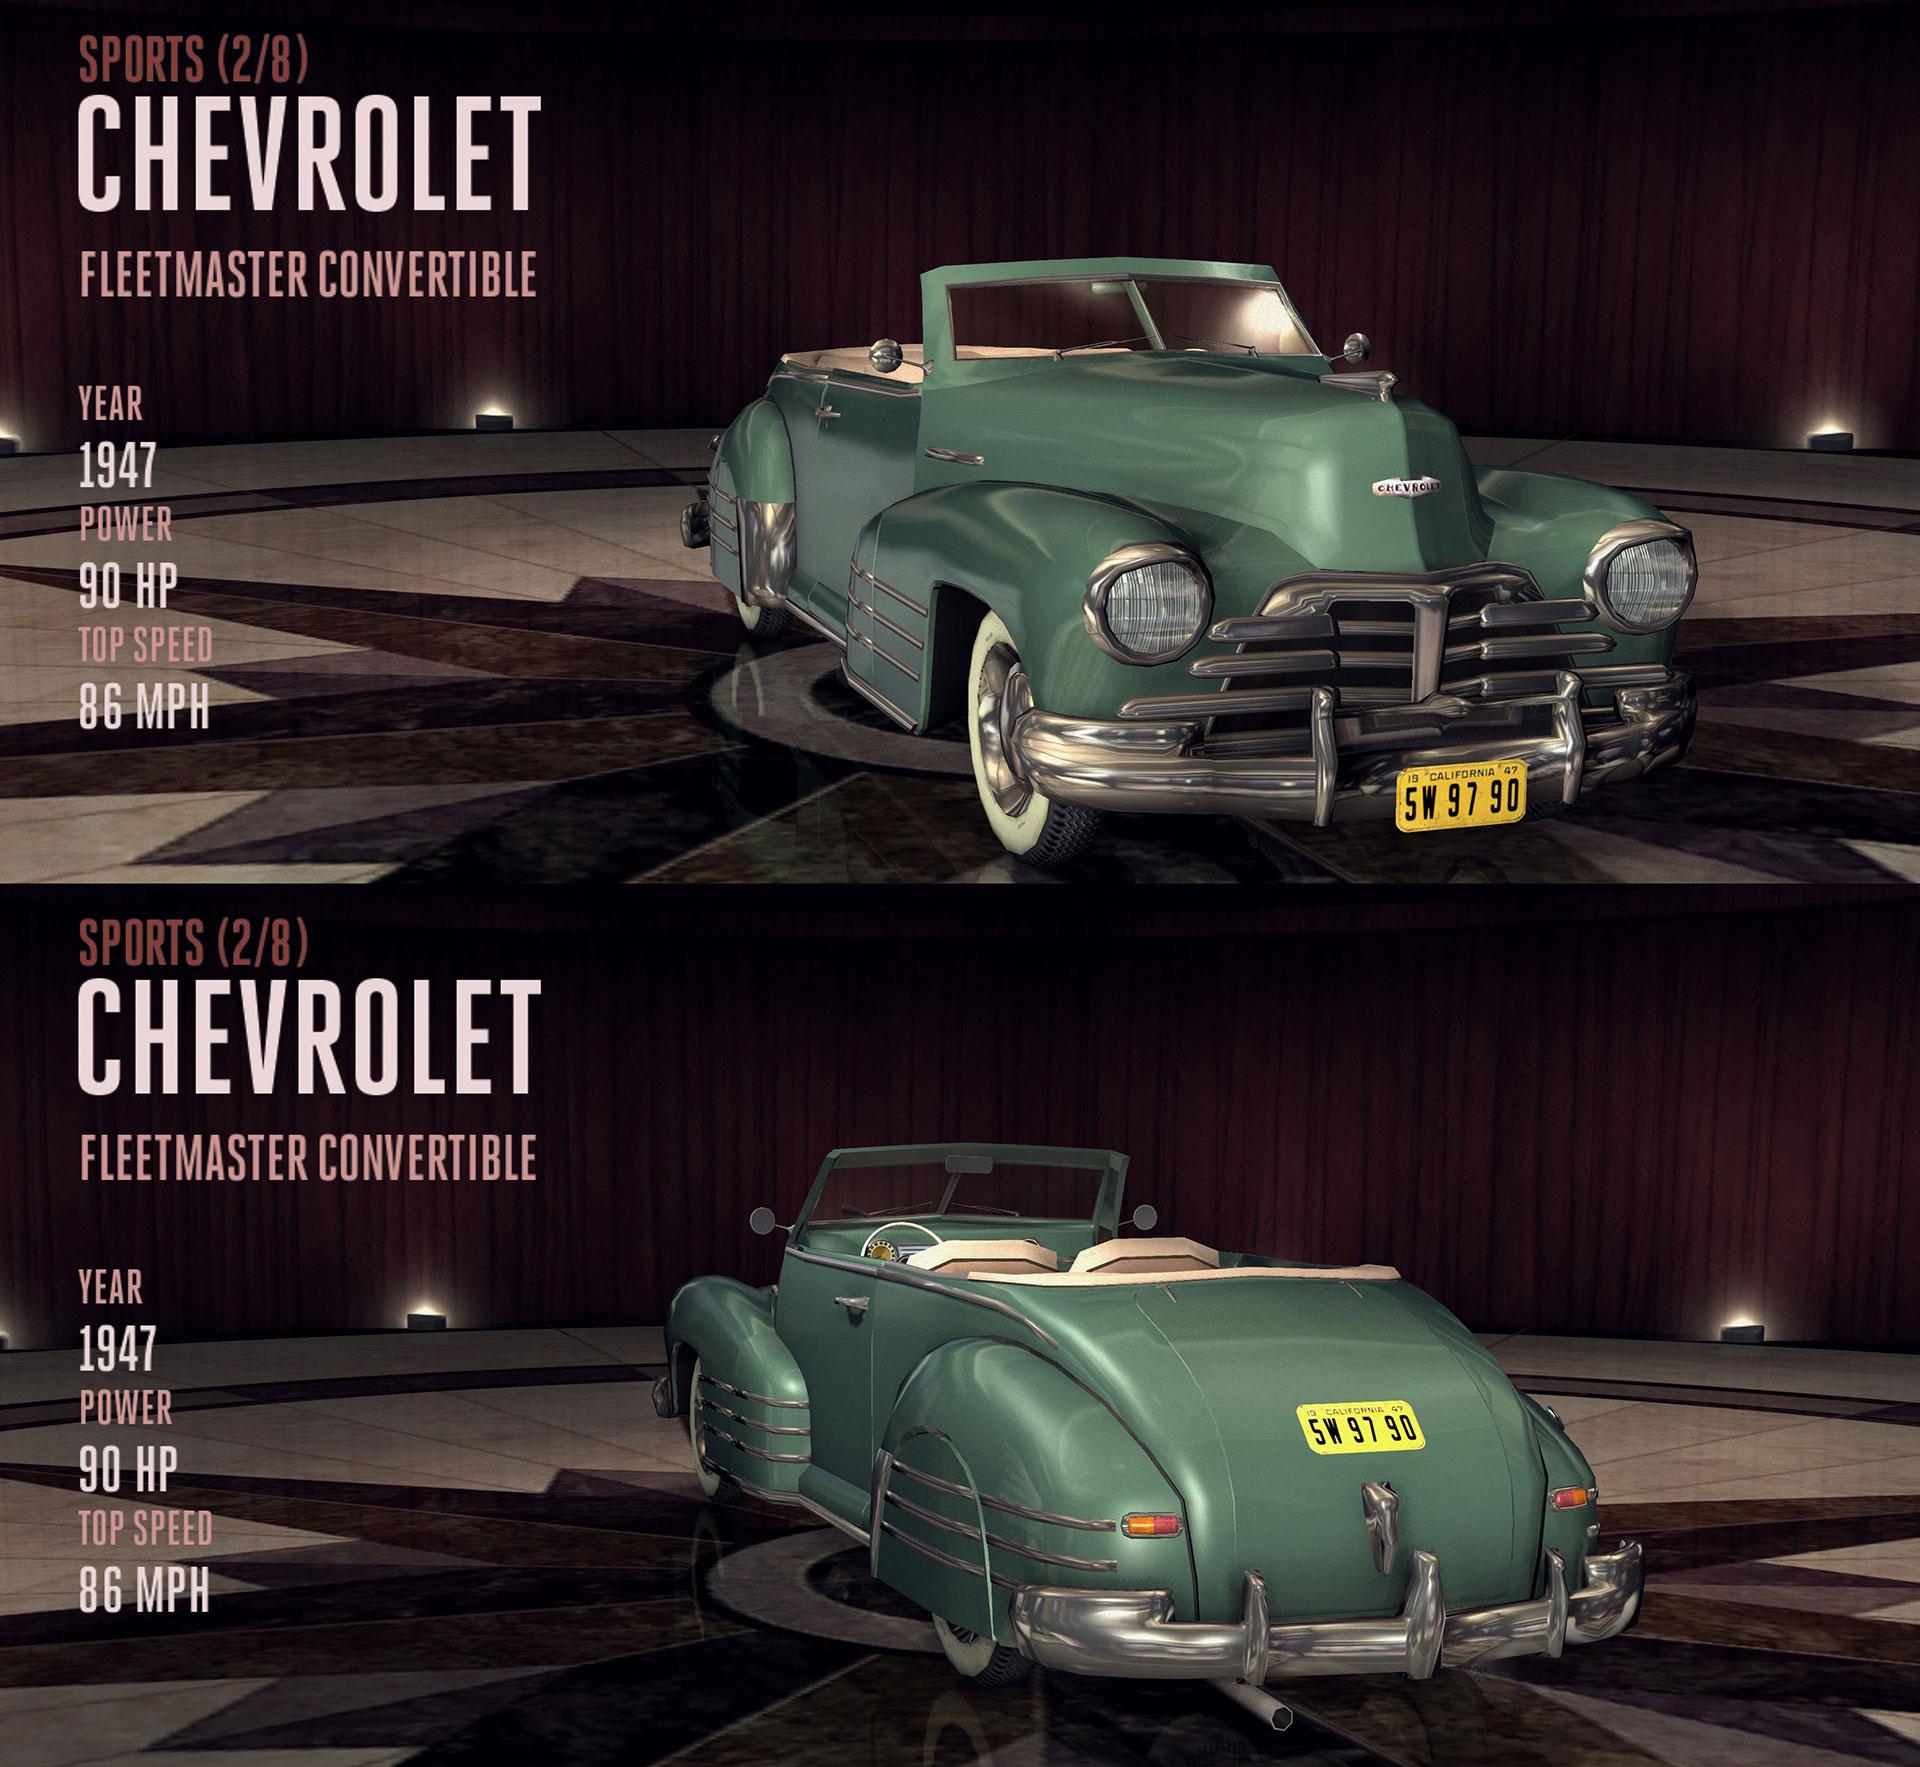 File:1947-chevrolet-fleetmaster-convertible.jpg